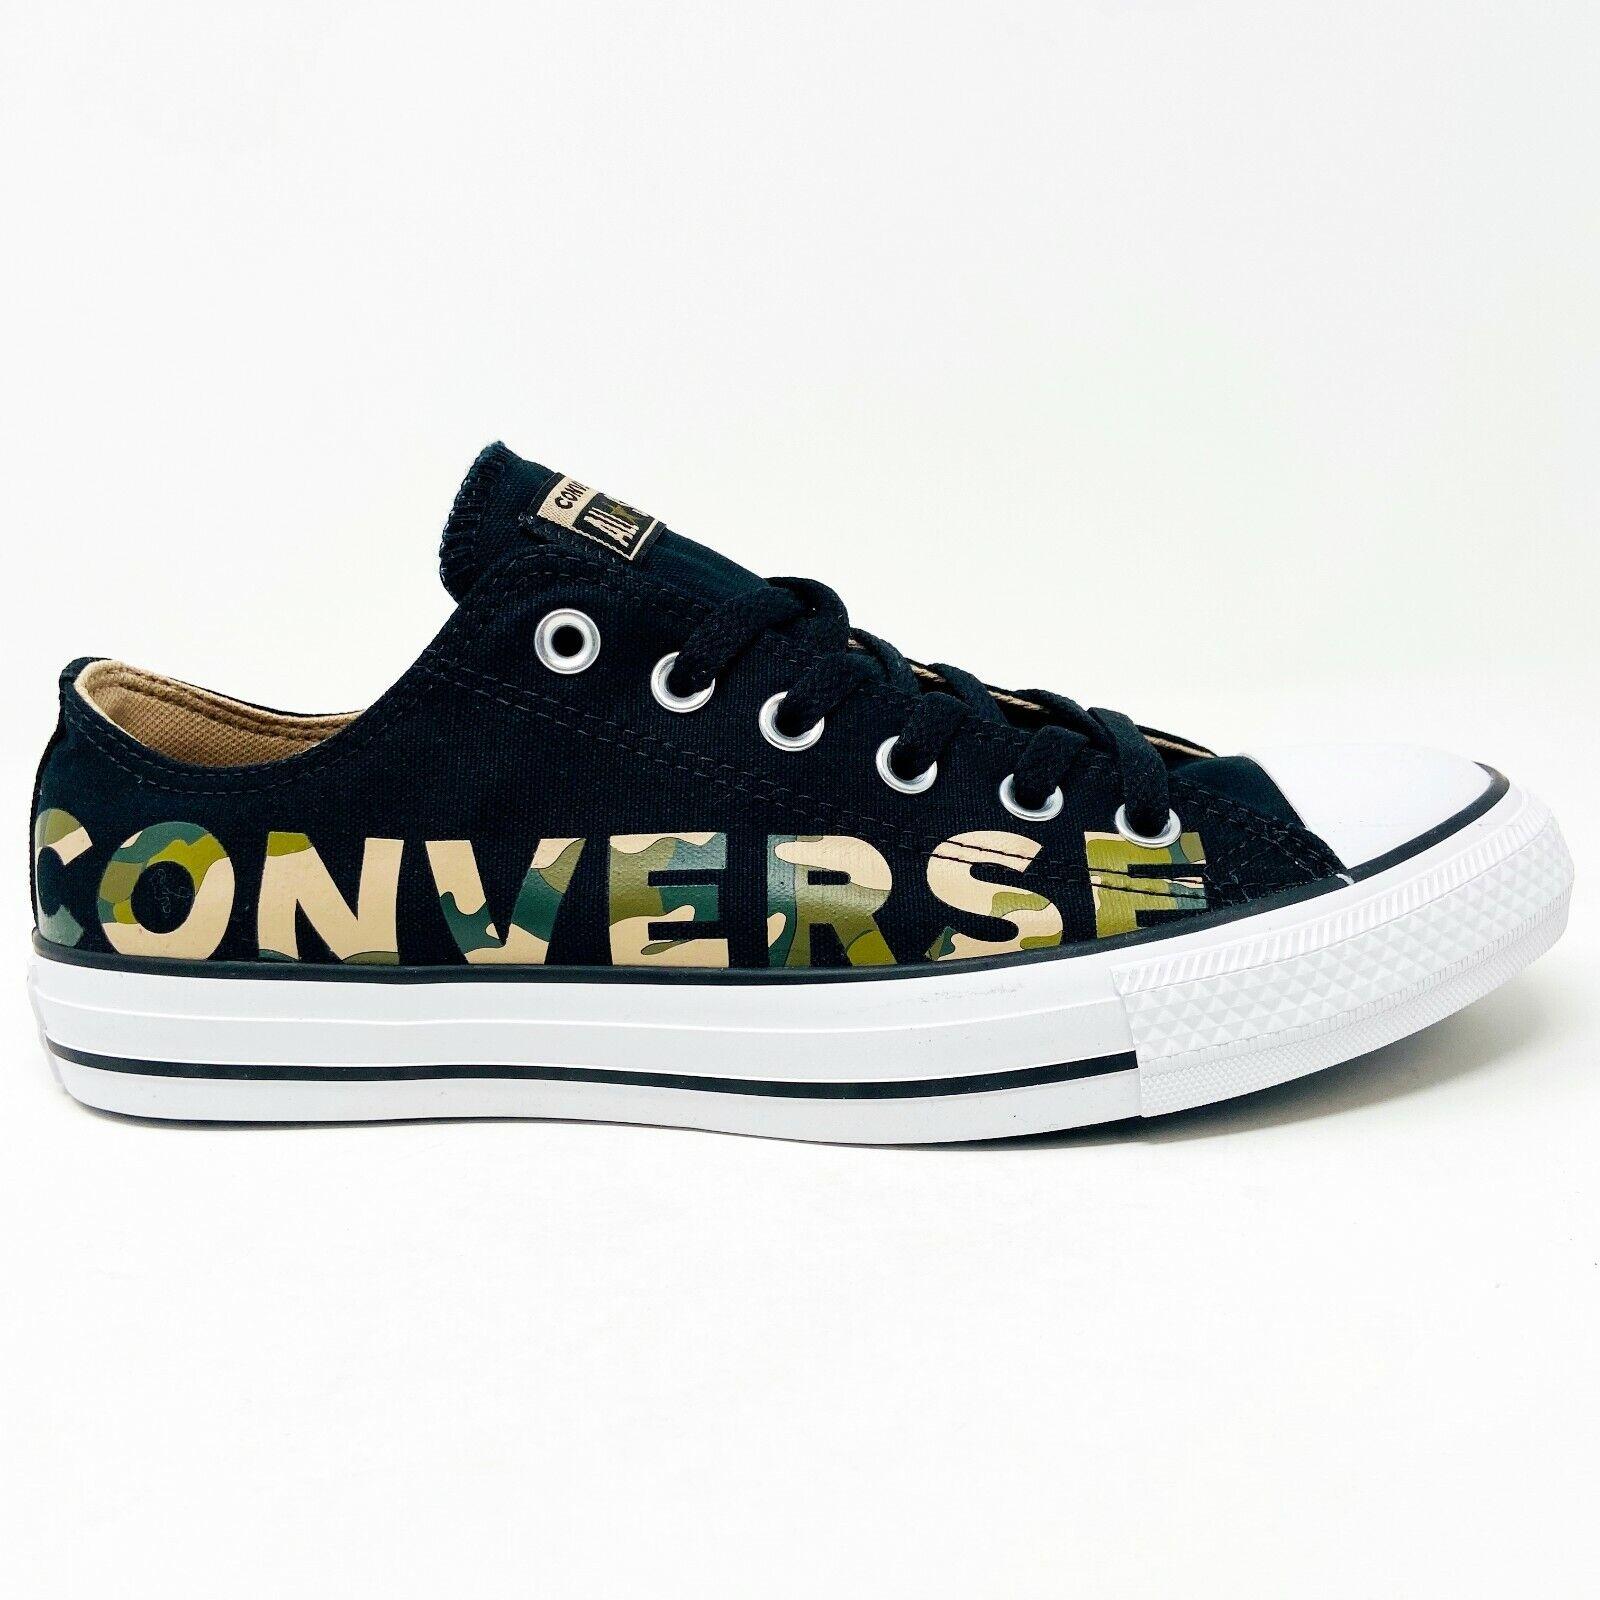 Converse Womens Chuck Taylor All Star